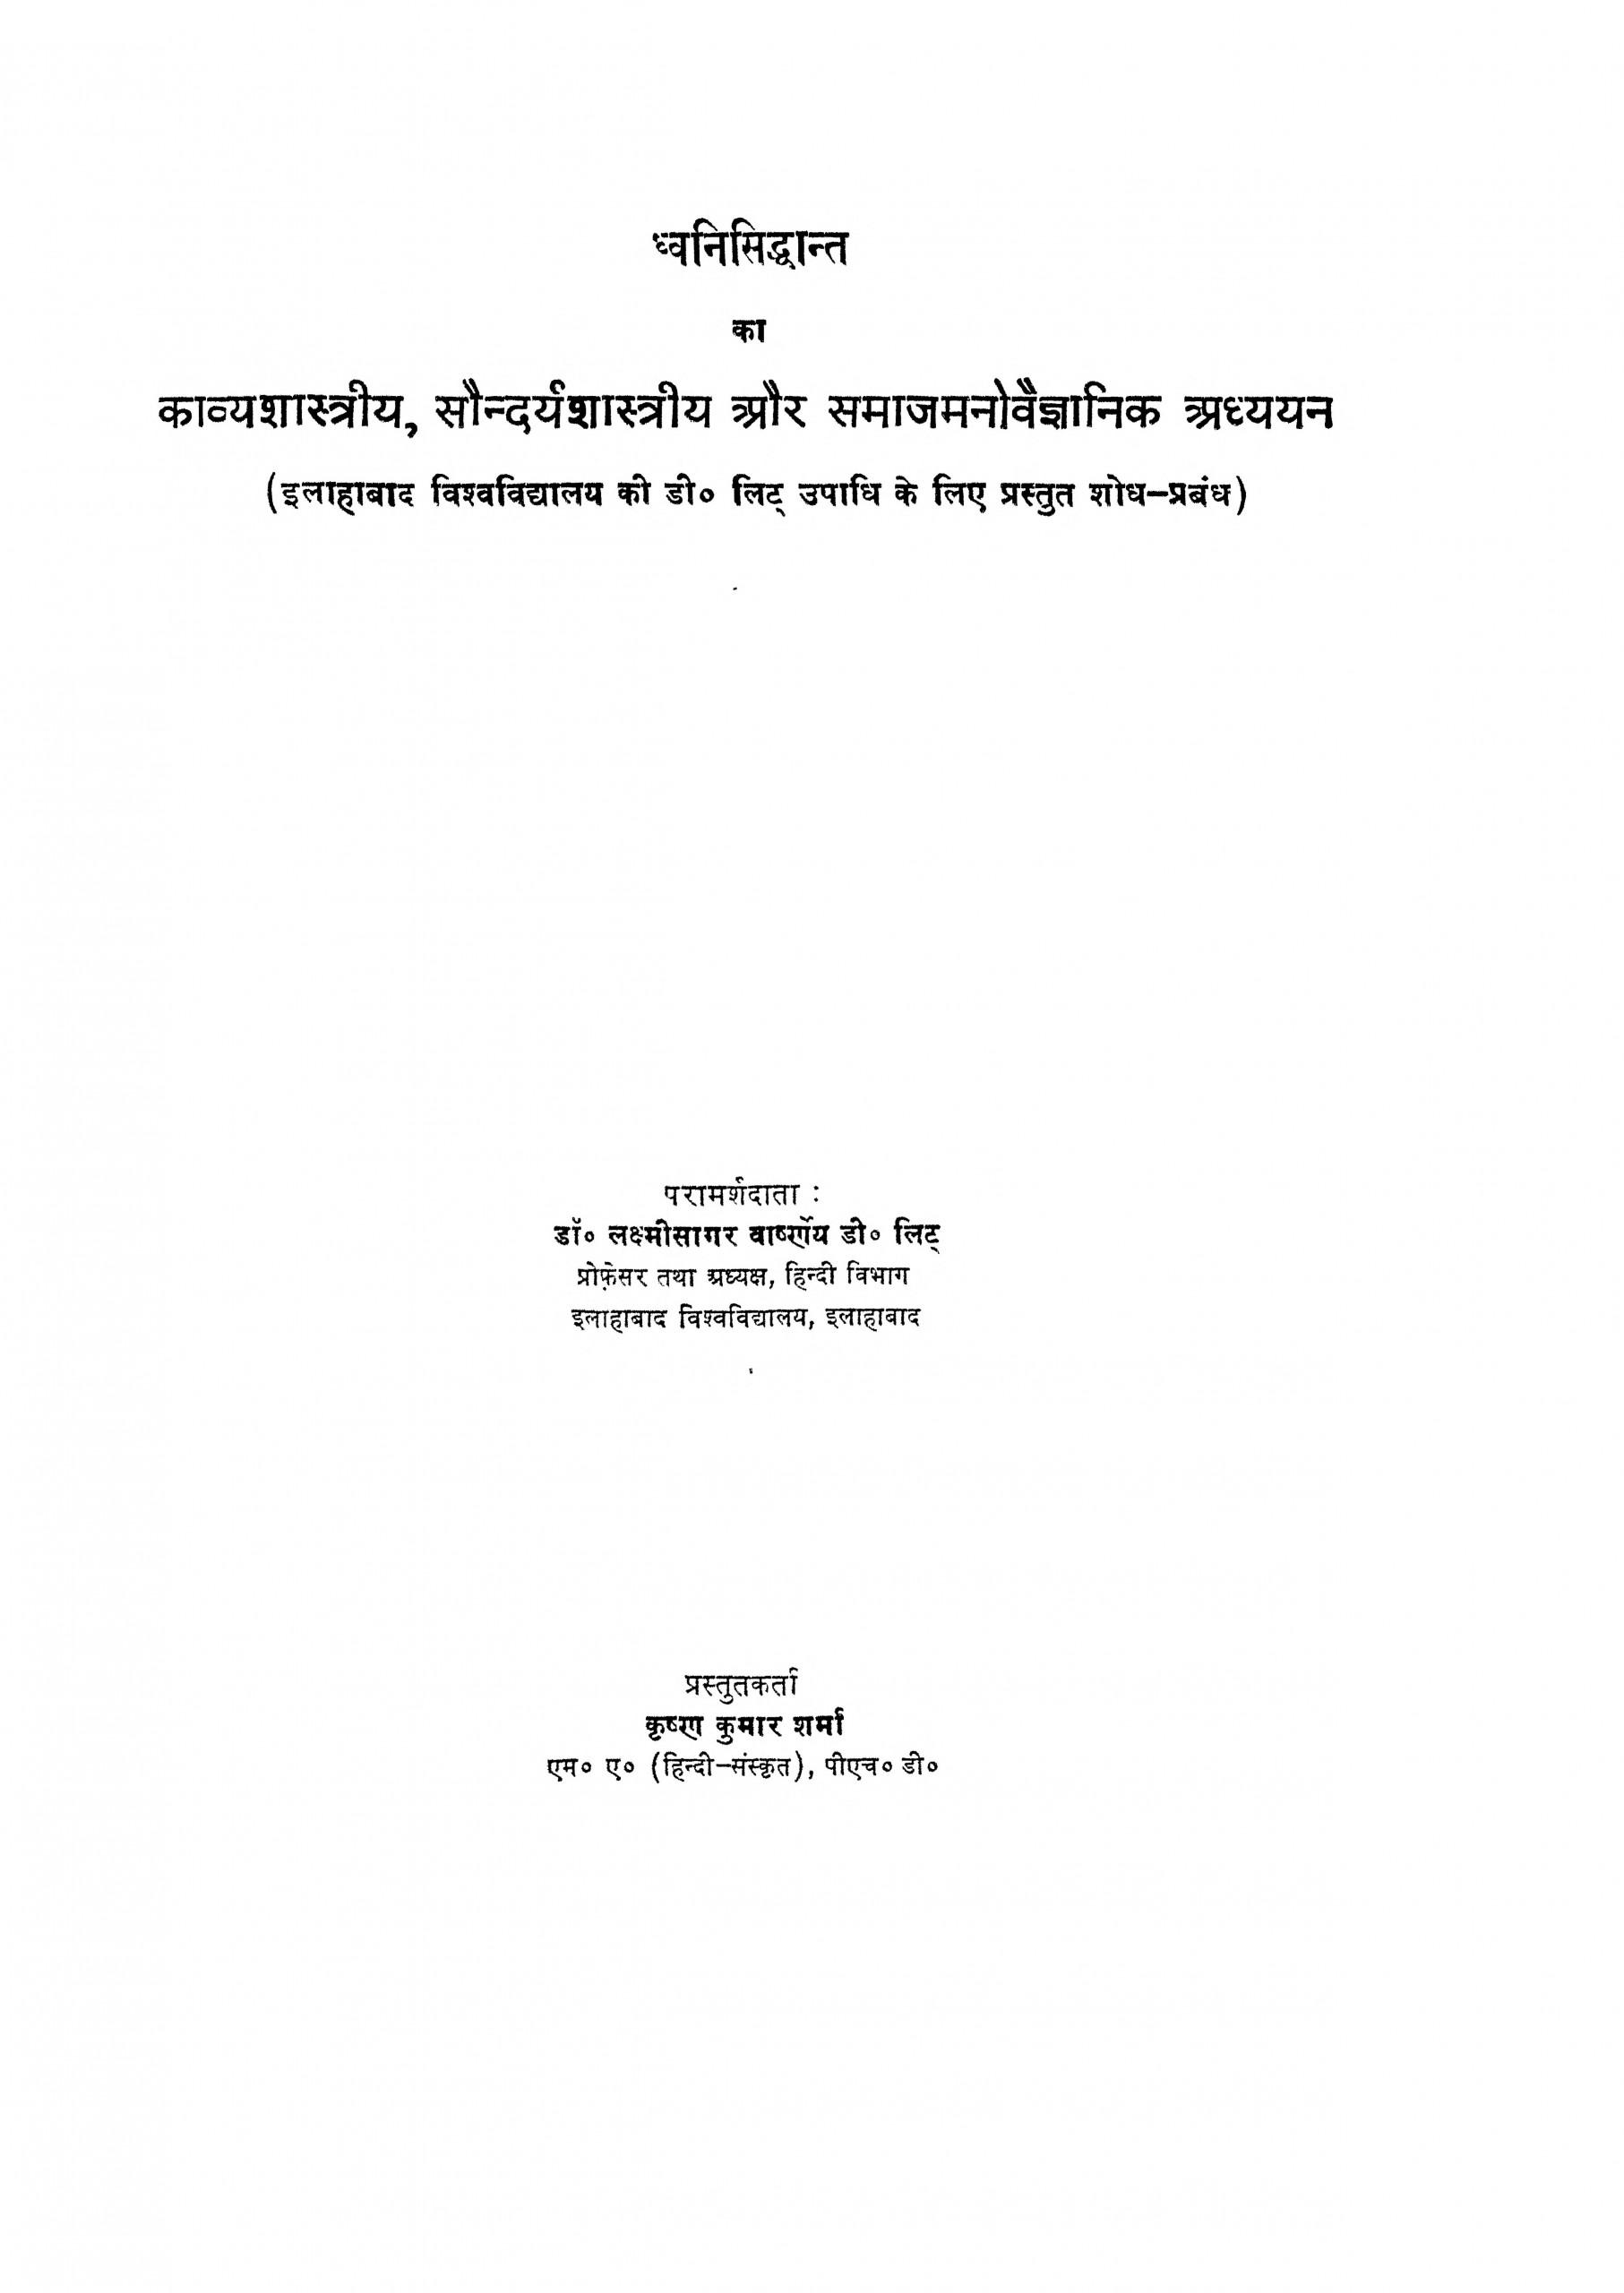 Book Image : ध्वनिसिद्धान्त का काव्यशास्त्रीय सौन्दर्यशास्त्रीय और समाजमनोवैज्ञानिक अध्ययन  - Dhwanisiddhant Ka Kavayshastriy Saundaryashastriy Aur Samajamanovaiganik Adhyayan